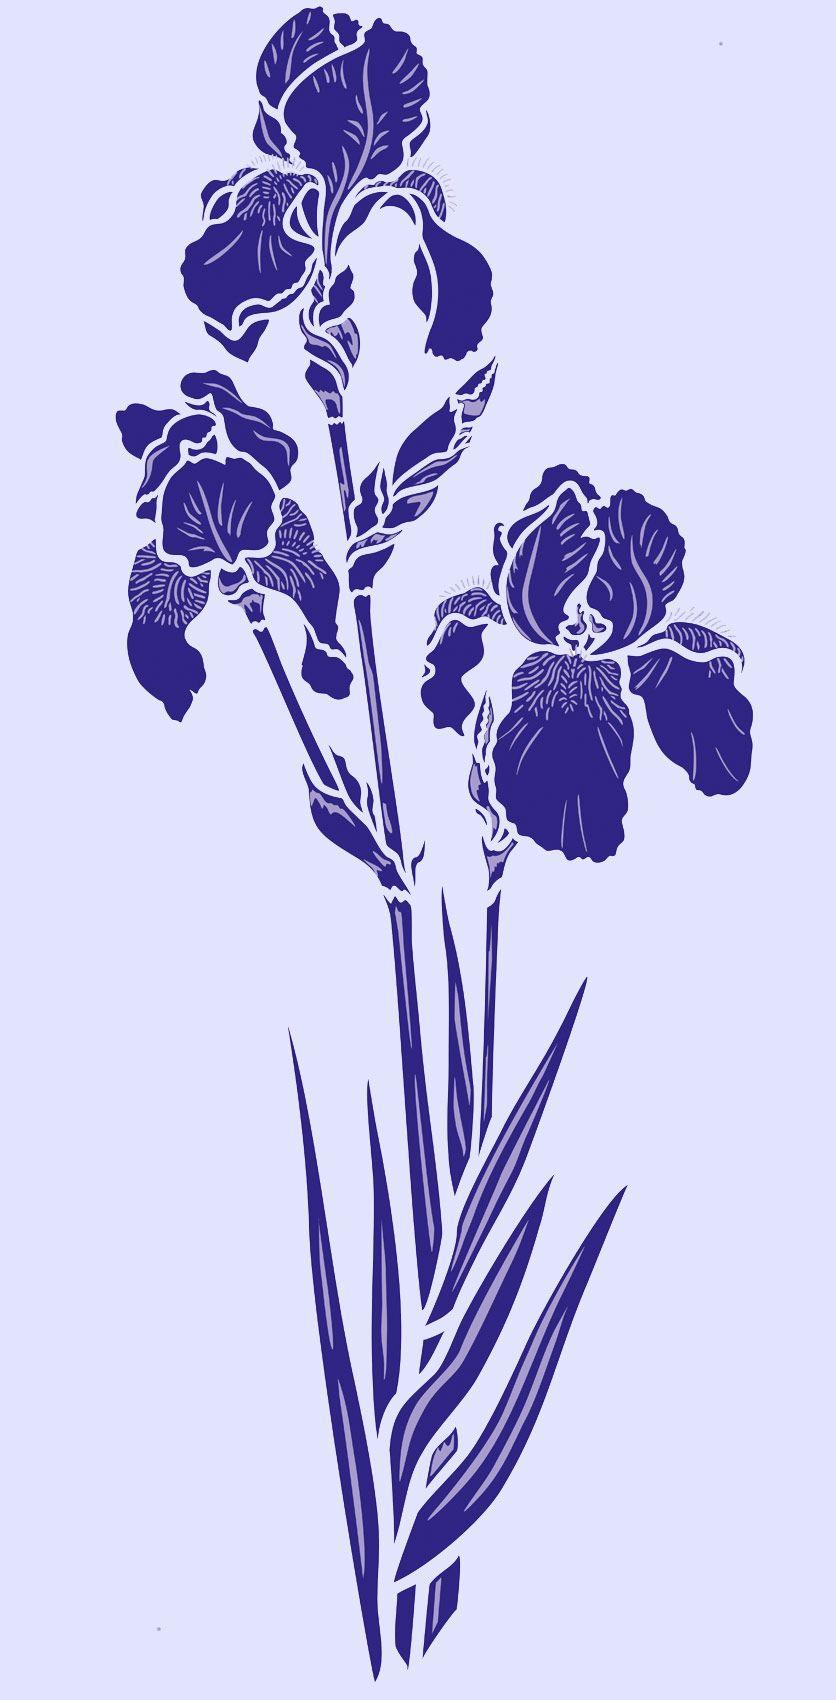 Large Iris Theme Pack Beautiful Iris Flower Stencils 2 X 2 Sheet Designer Stencils Iris Stencils 1 2 Beautiful Elegant Designer Iris Stencils In 2020 Flower Stencil Flower Painting Iris Flowers